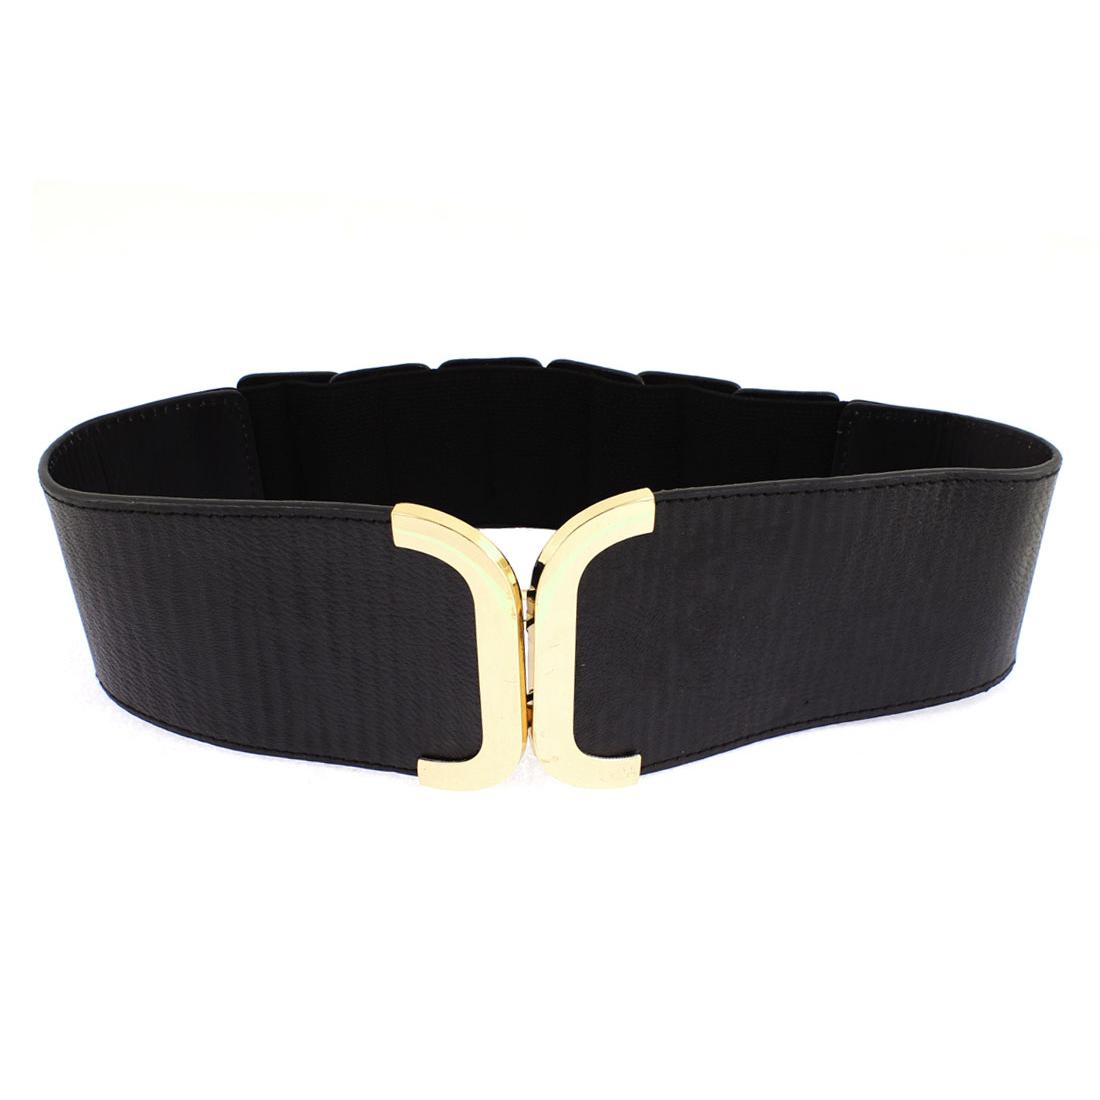 Adjustable Elastic Wide Waistband Waist Belt Black for Lady